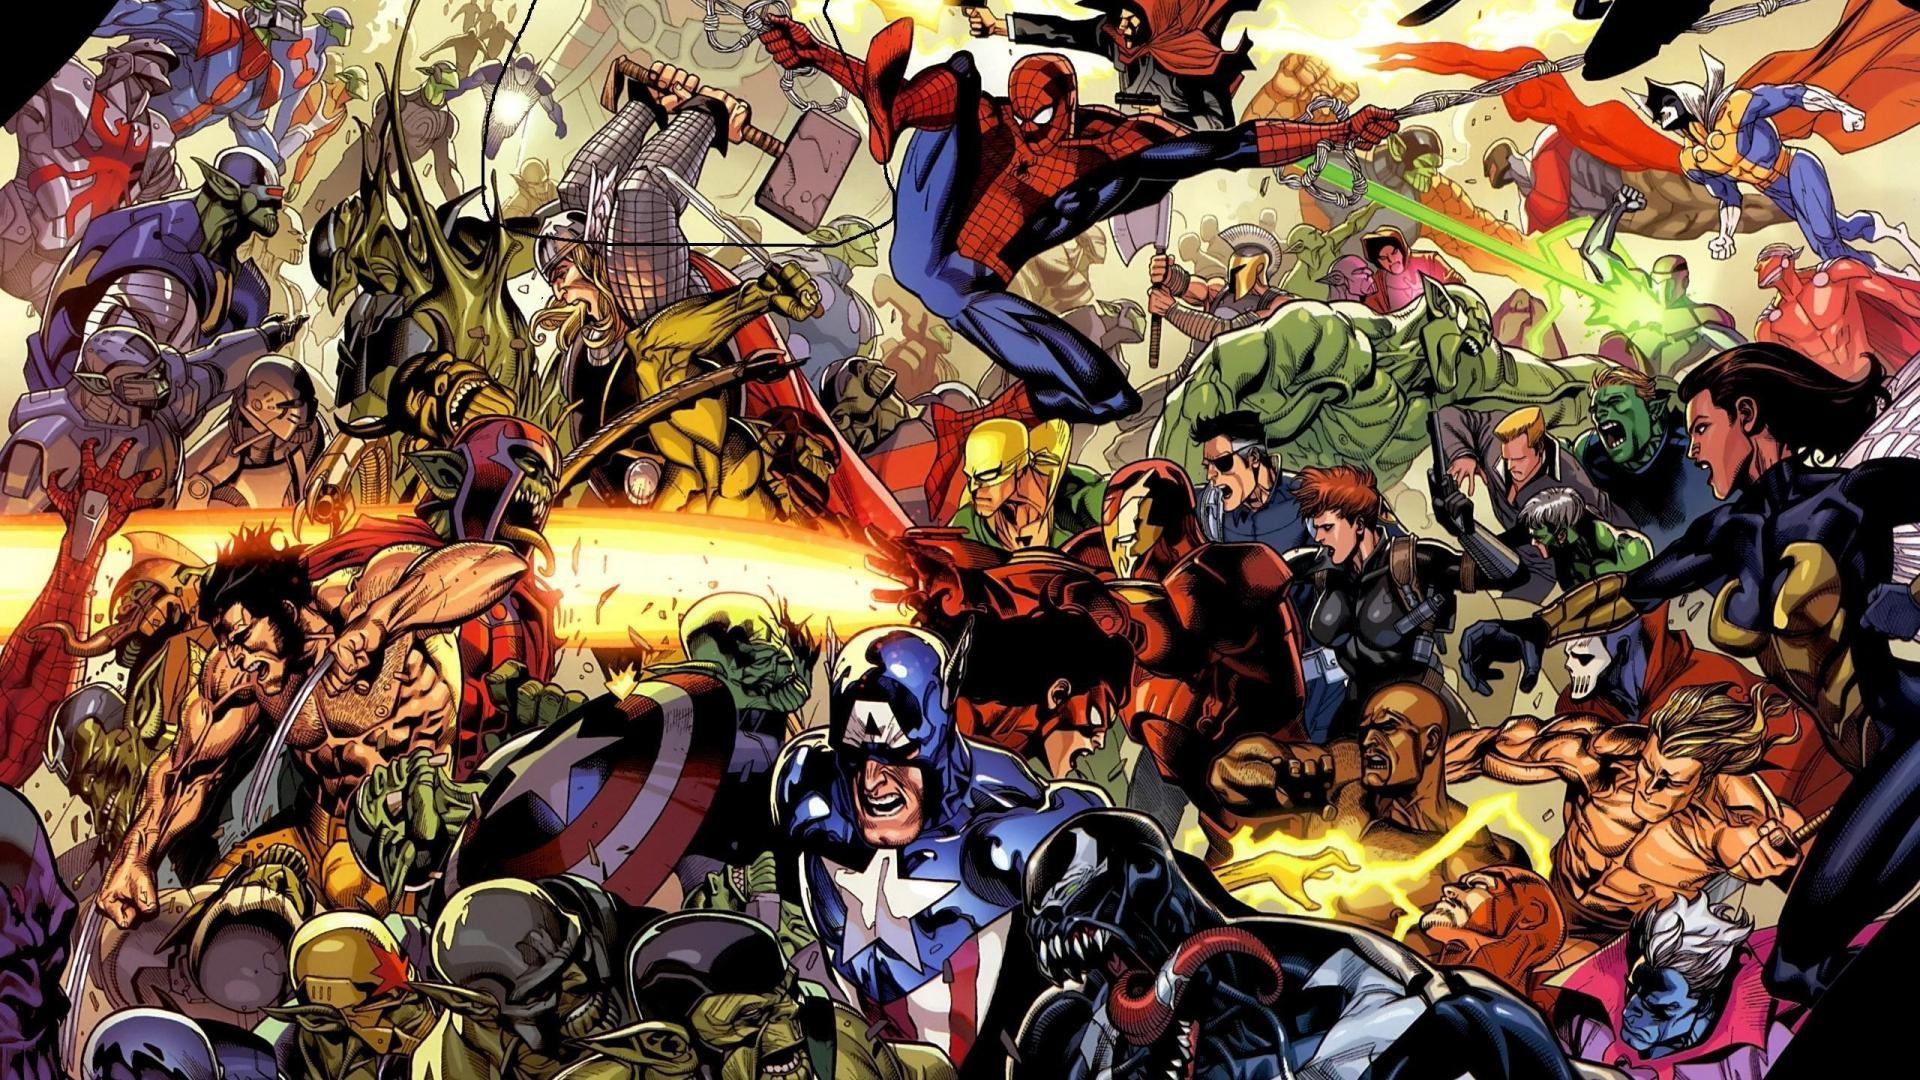 Cool screensavers site: Marvel screensaver superheroes wallpaper